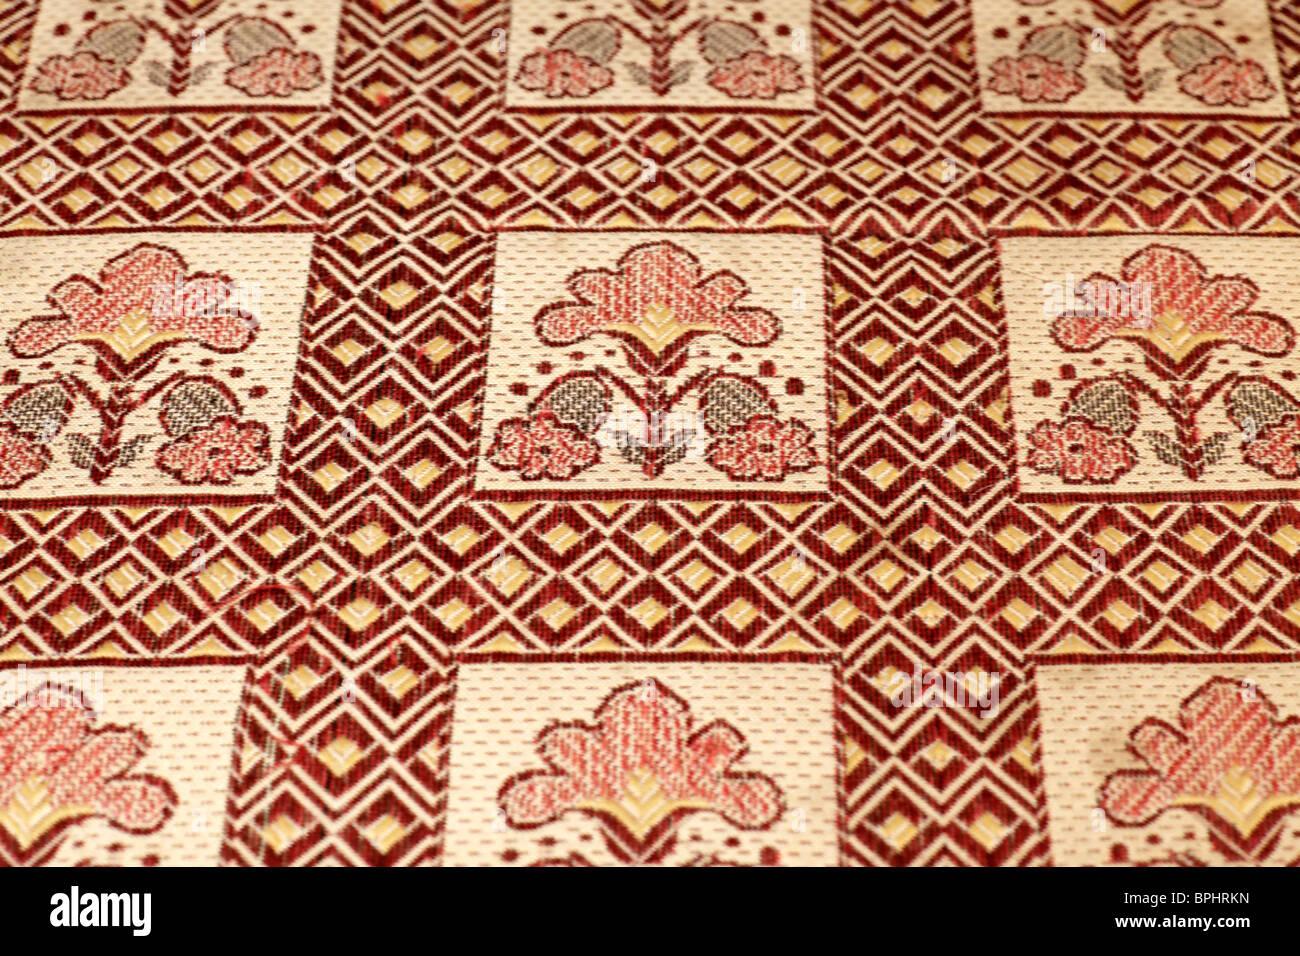 Tapestry Weave Stockfotos & Tapestry Weave Bilder - Seite 3 - Alamy